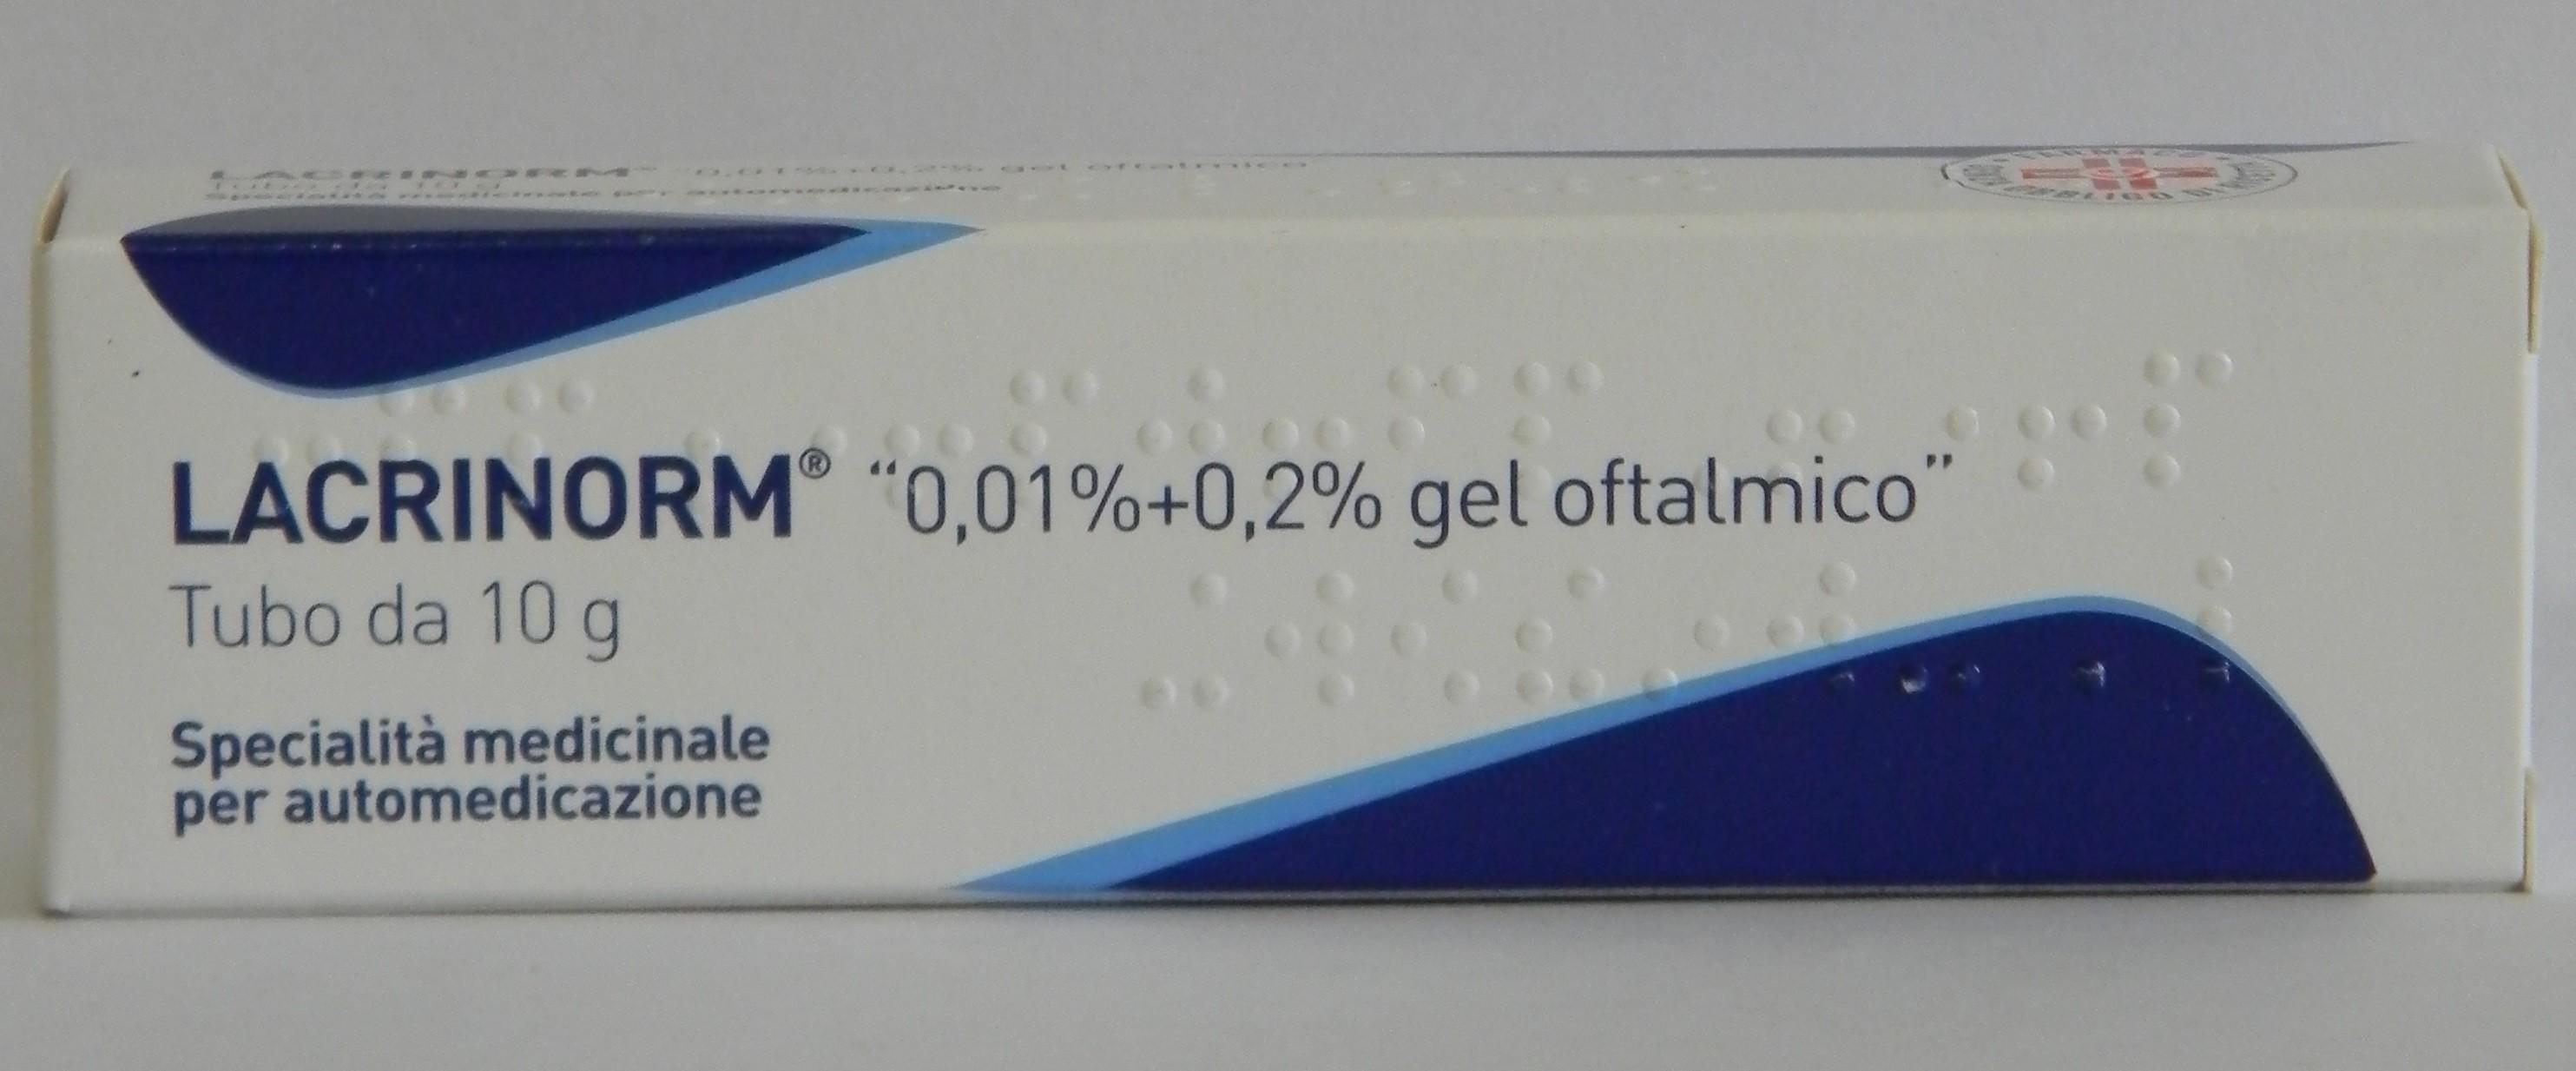 LACRINORM*GEL OFT 10G 0,01%